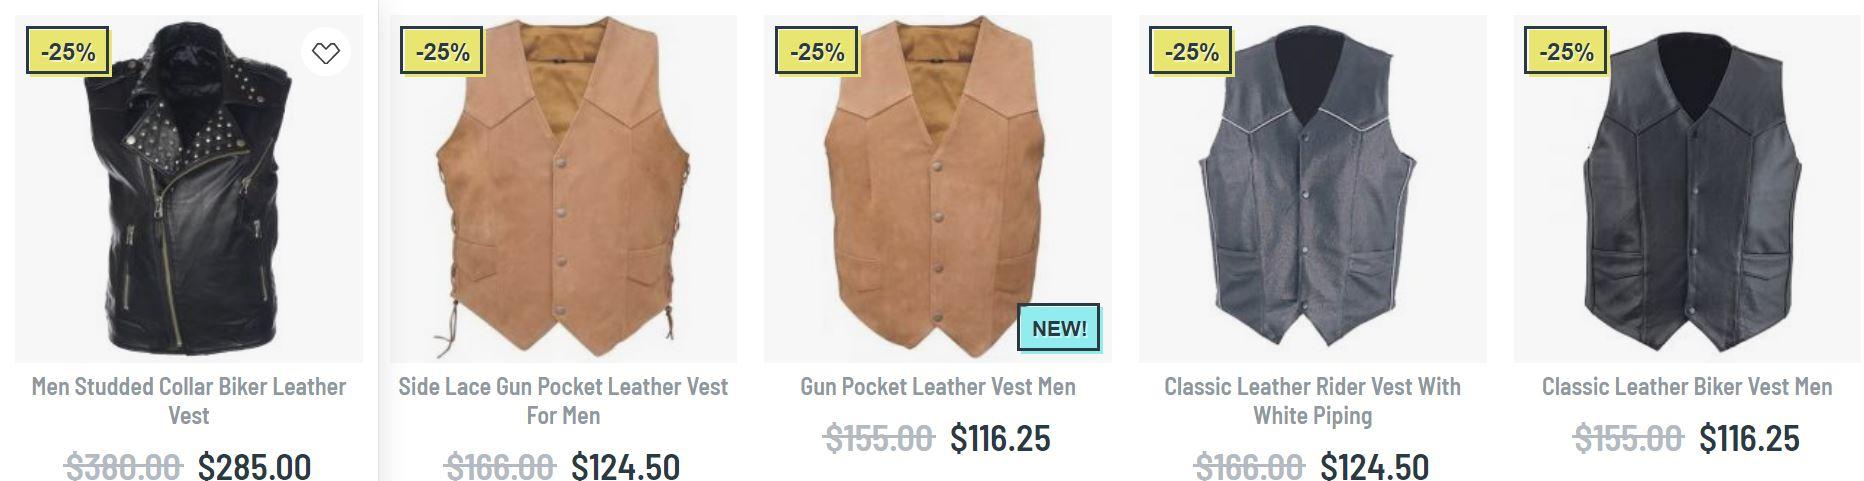 leather vest mens